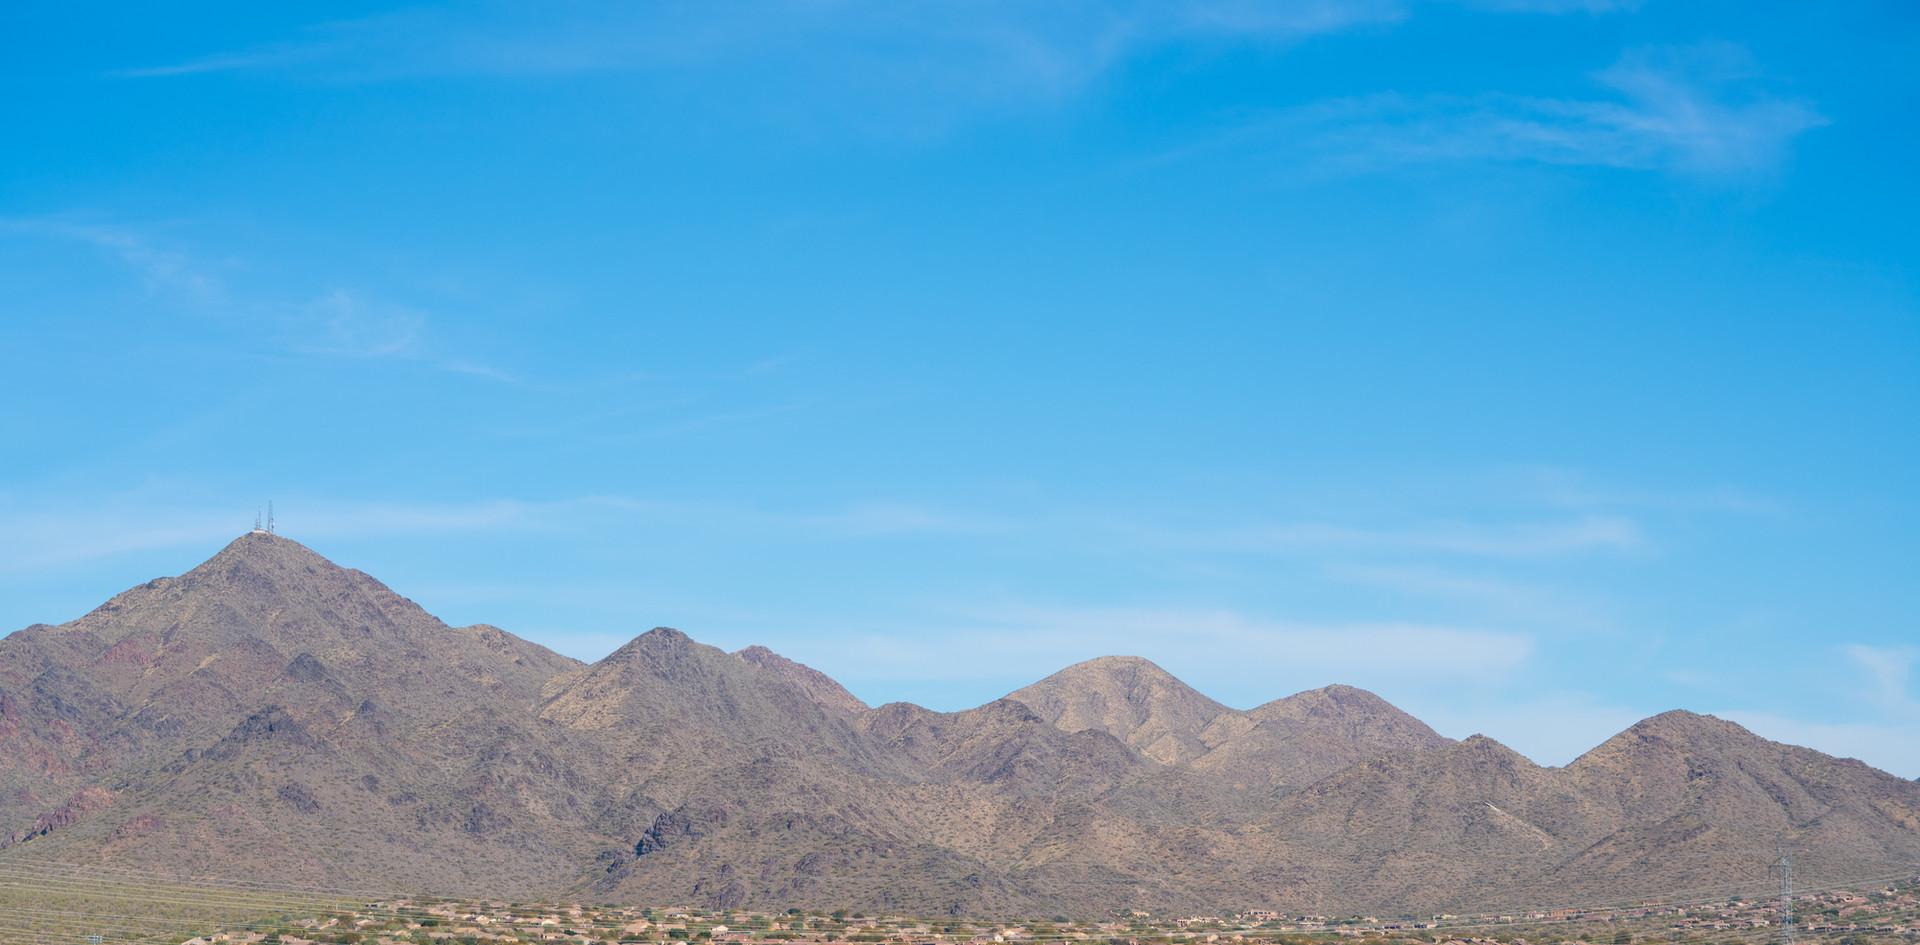 DSC08196-2 mountains.jpg